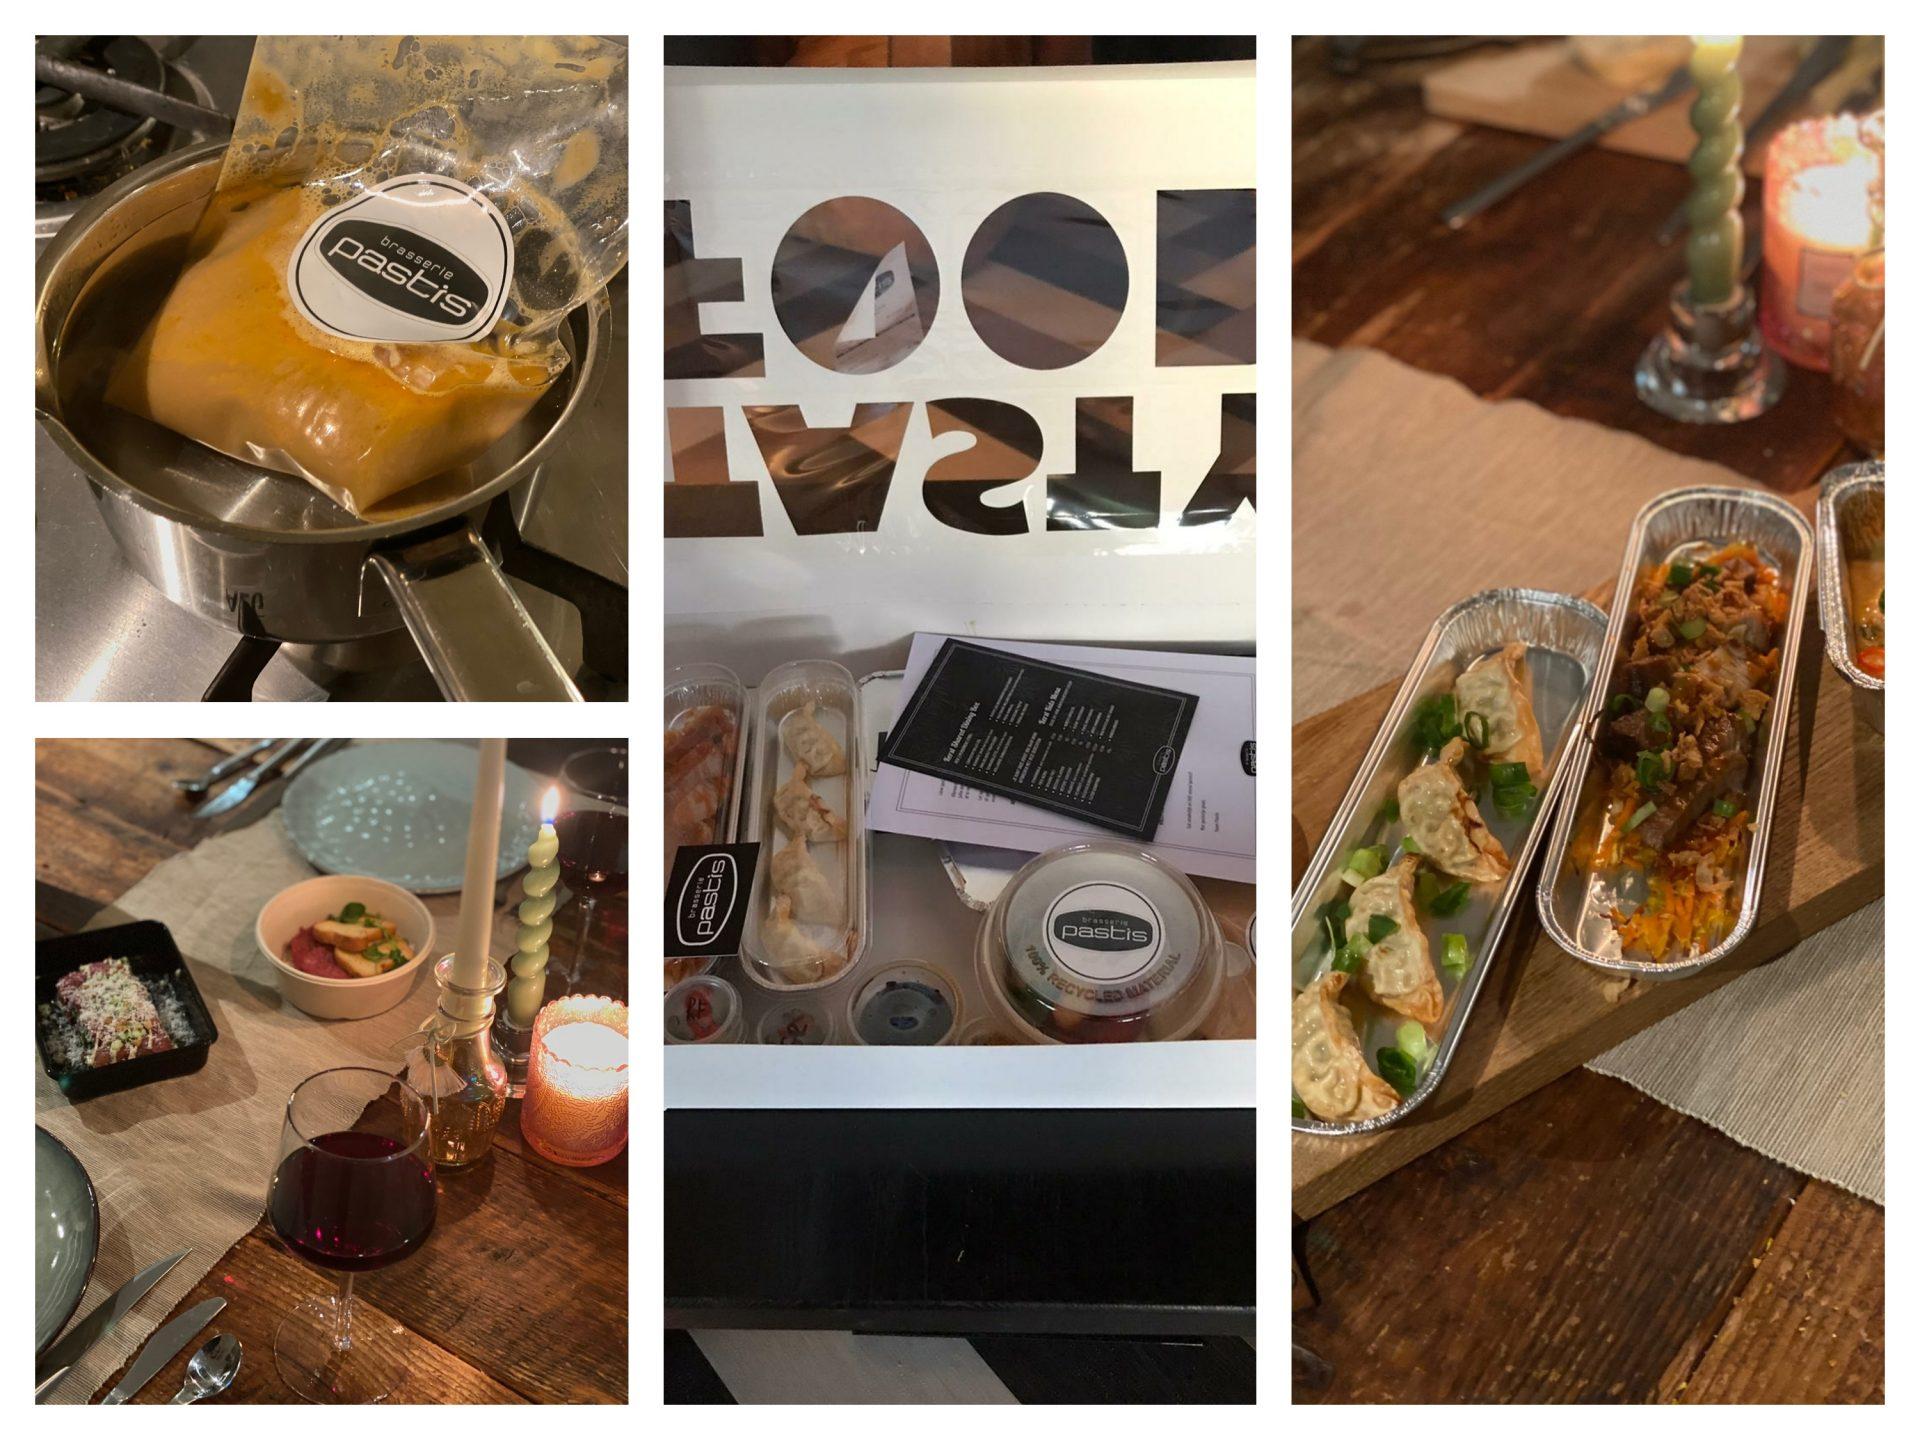 Thuisdineren met Social Deal - Brasserie Pastis in Rosmalen